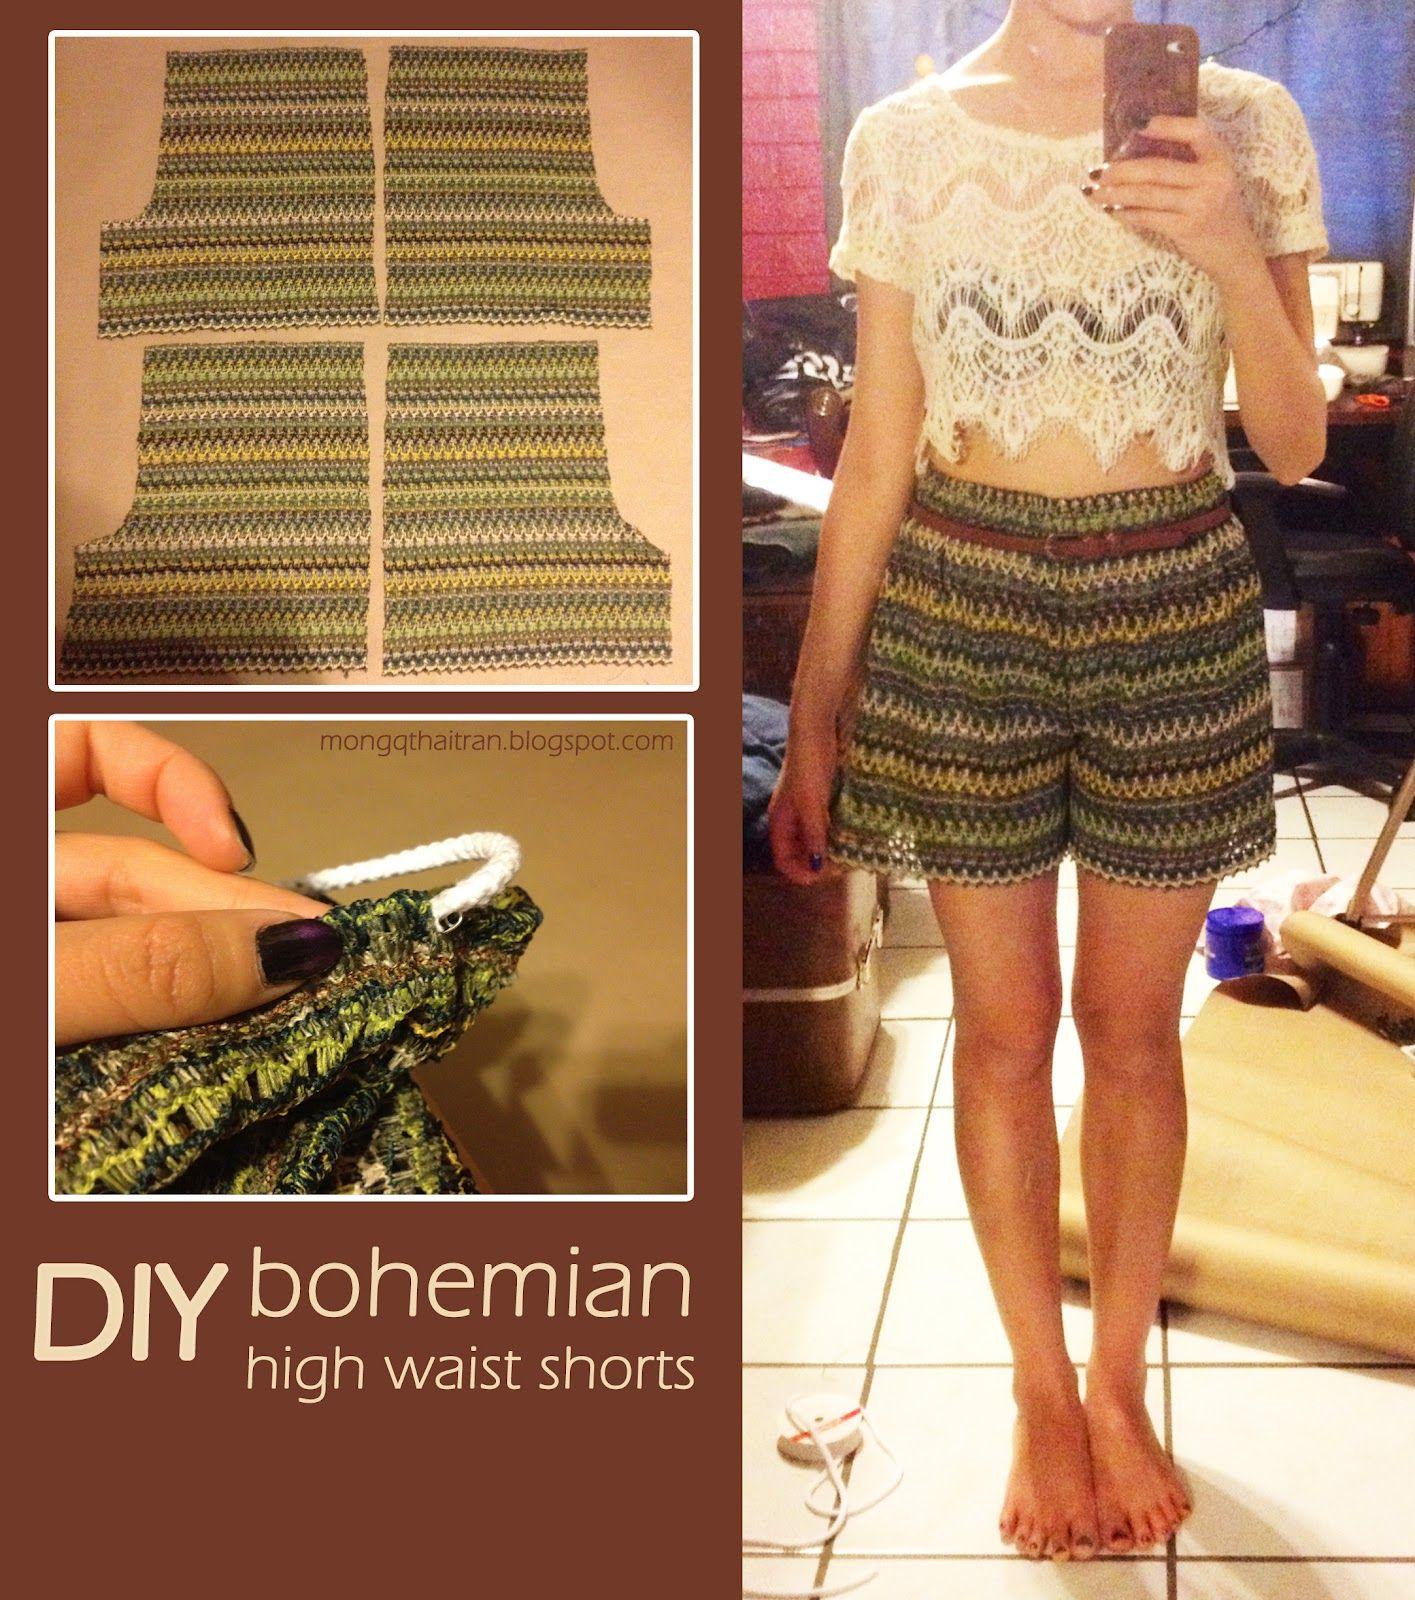 diy bohemian high waist shorts fashion pinterest